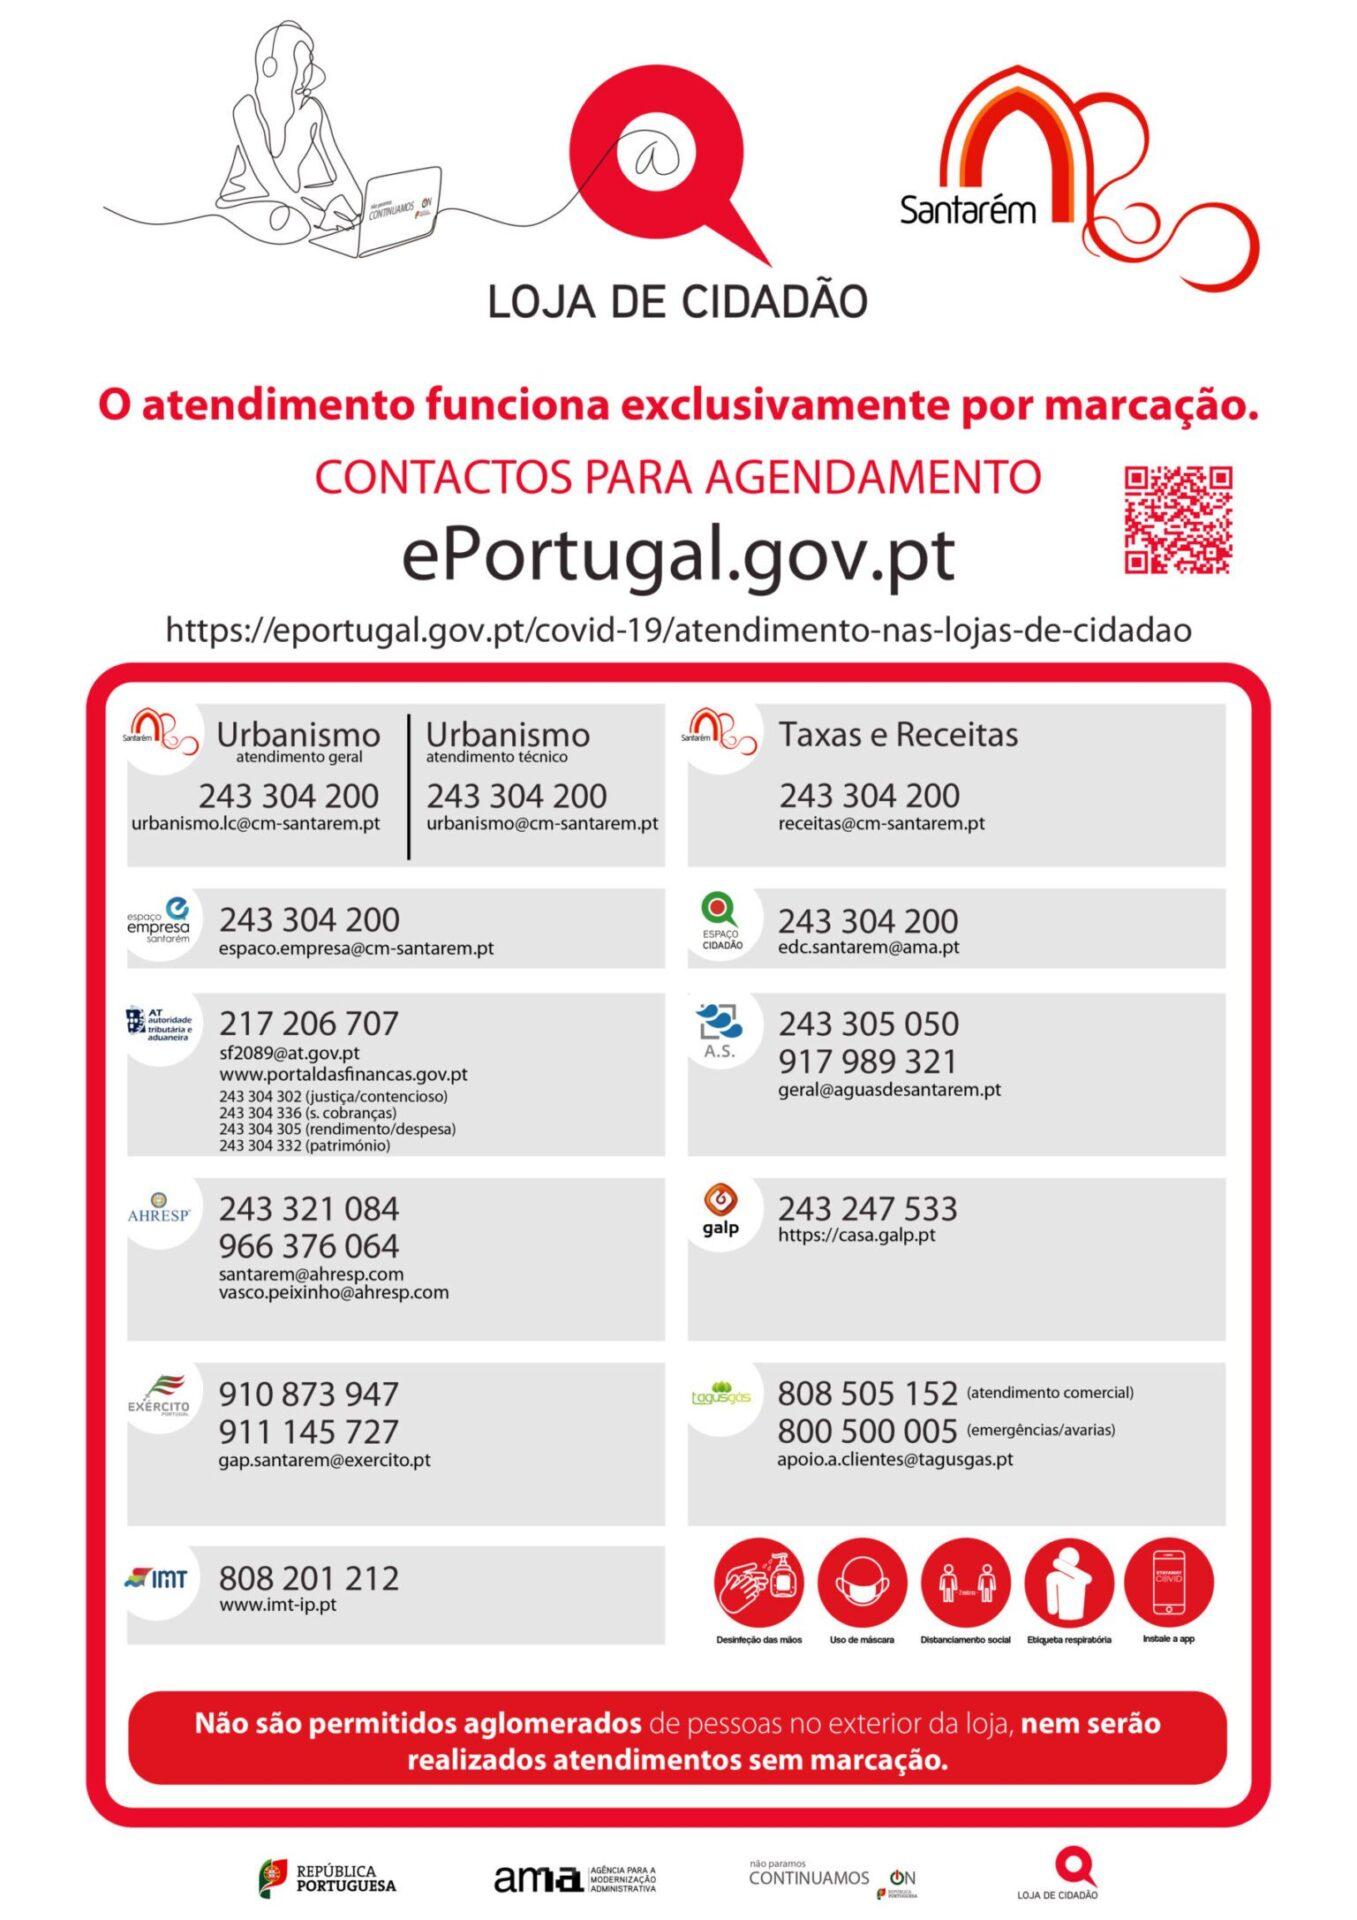 Loja-de-Cidadao-Santarem-1-scaled.jpg